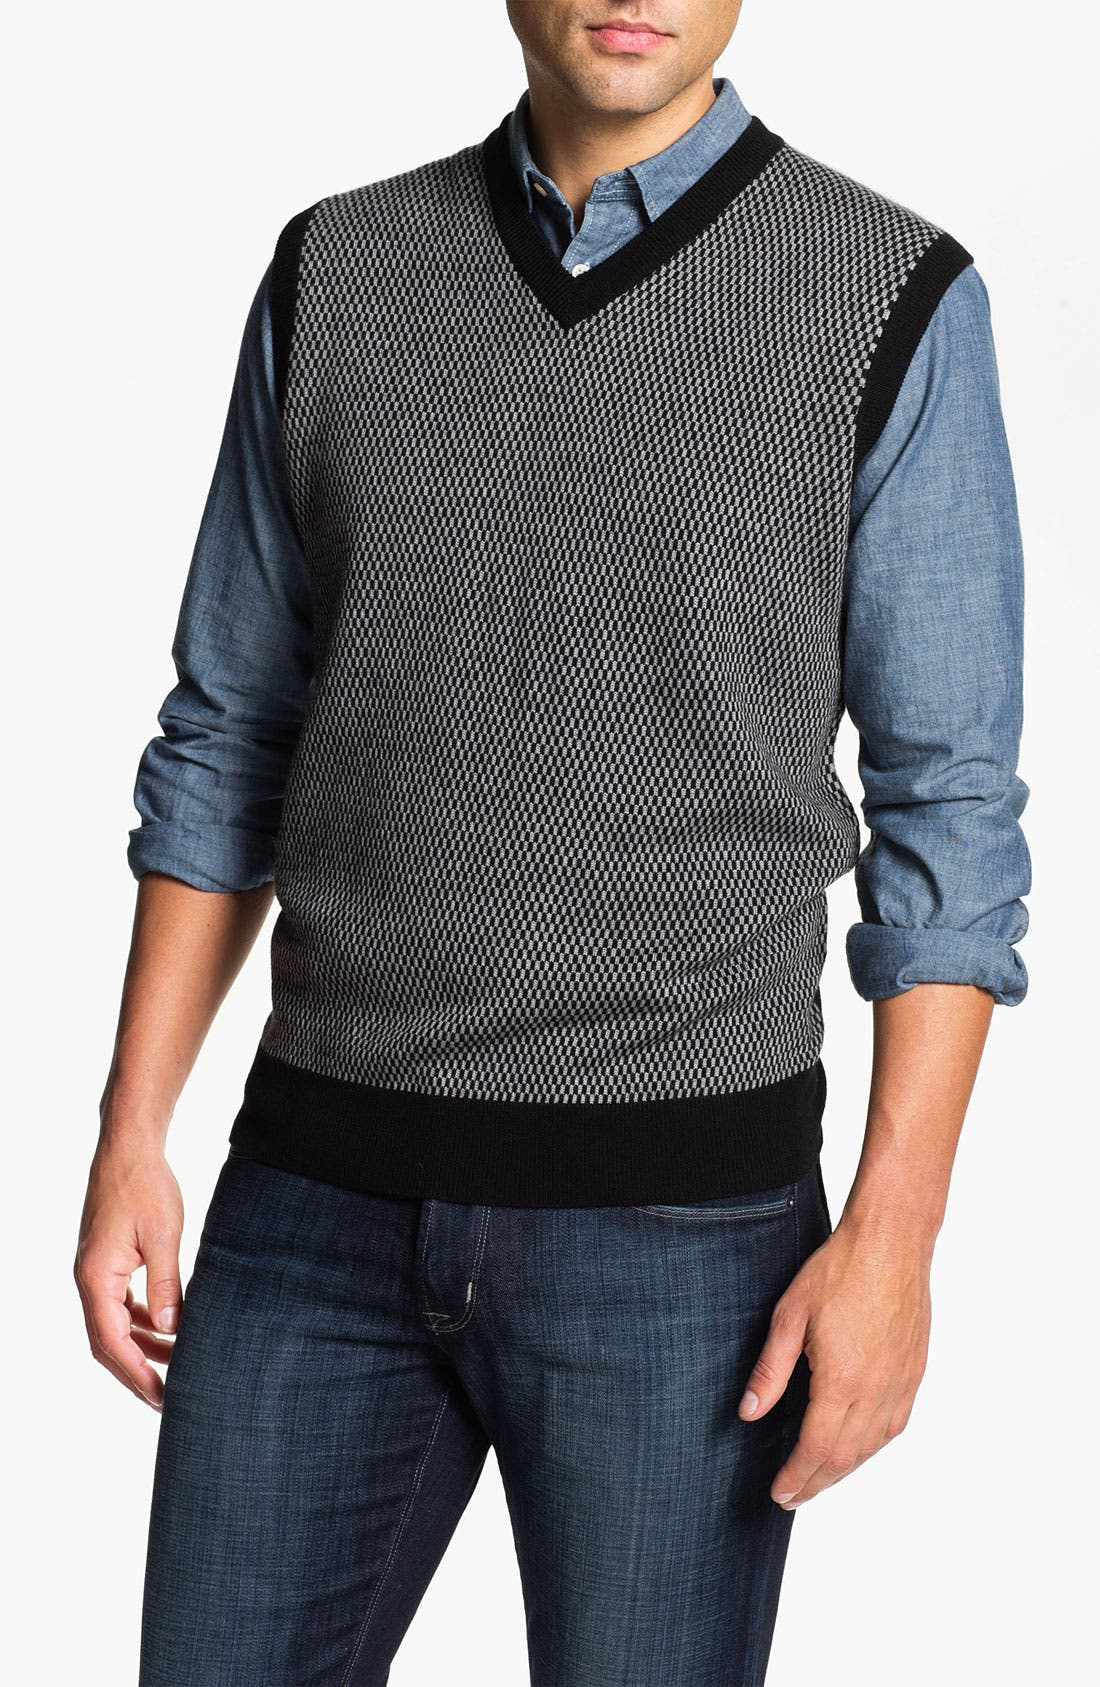 Alternate Image 1 Selected - Toscano Merino Wool Blend Sweater Vest